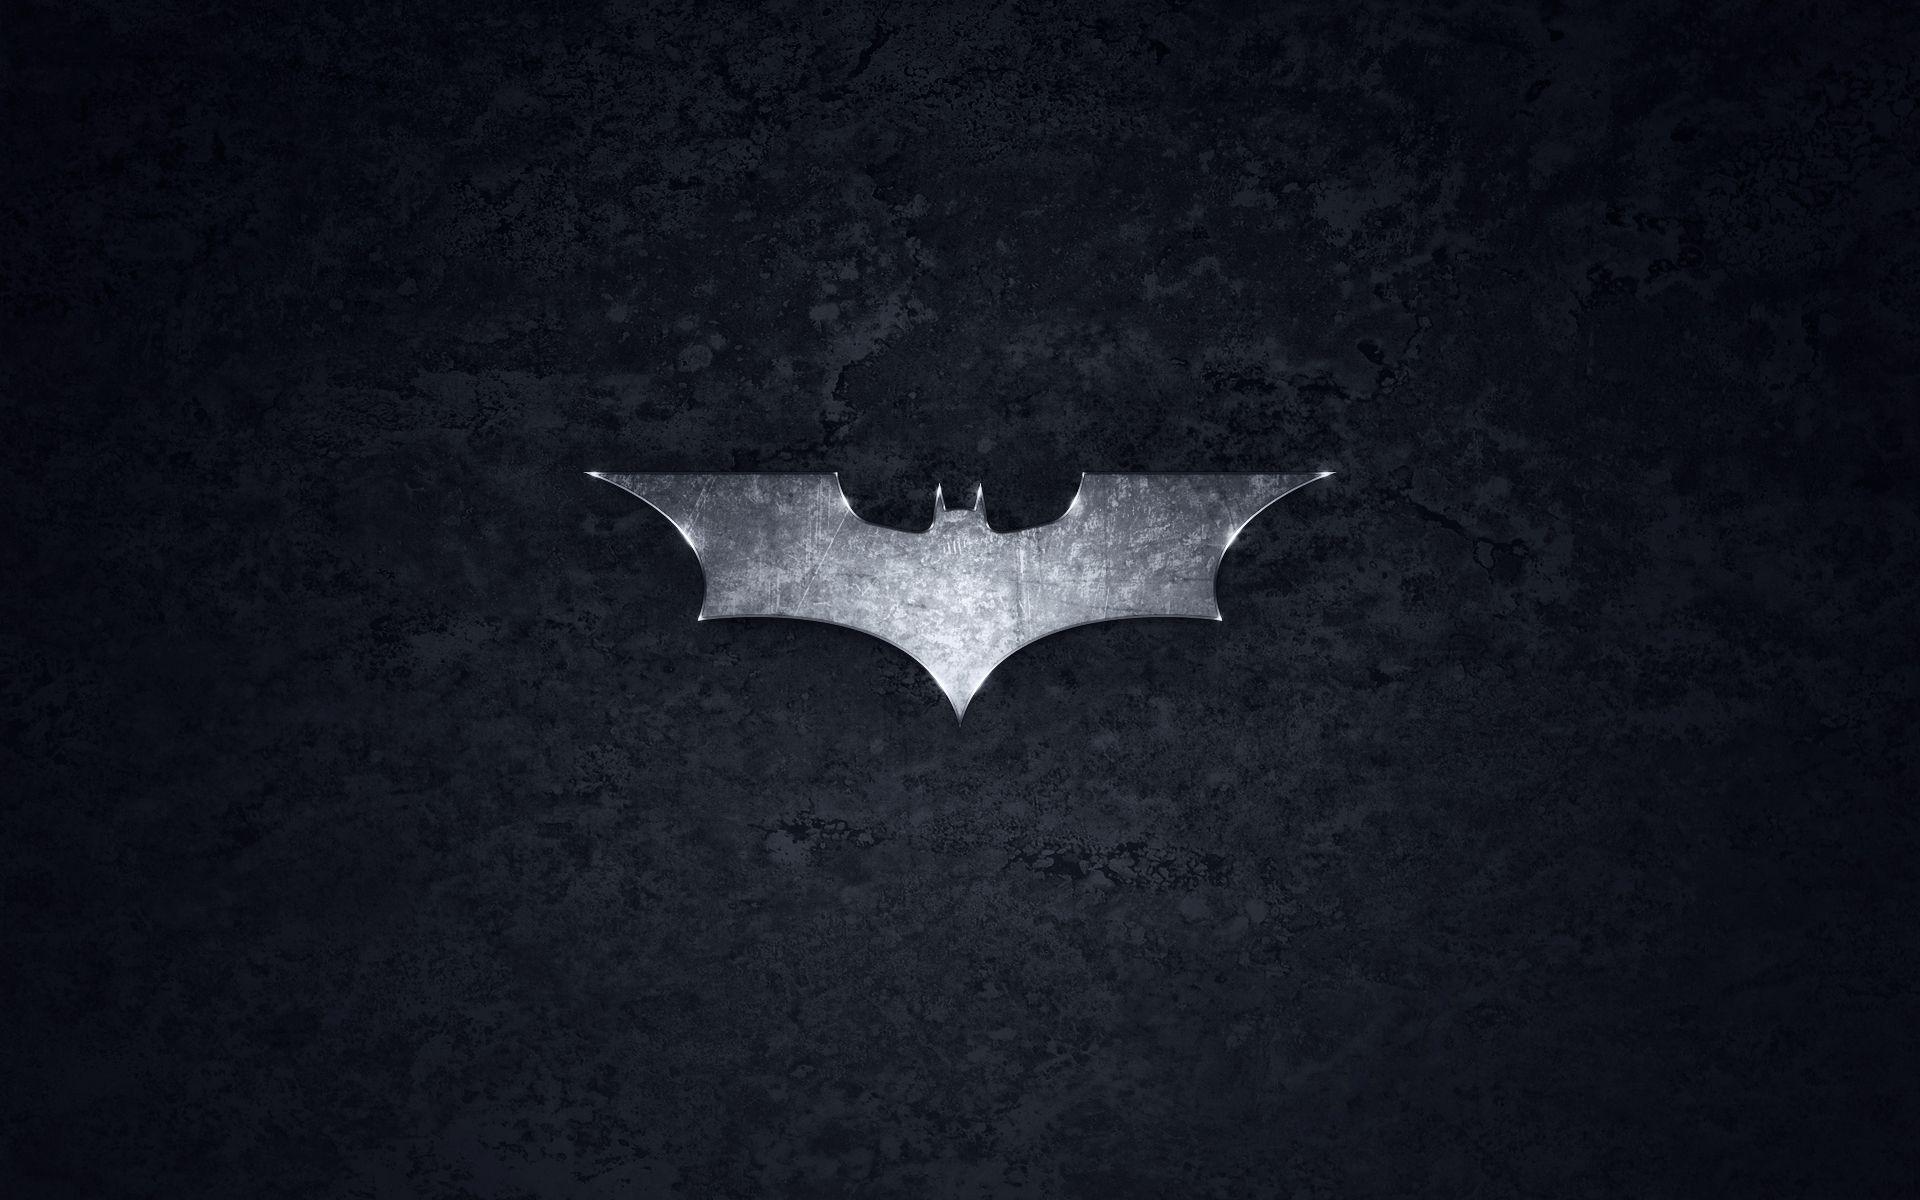 Cool Batman Logo wallpaper.